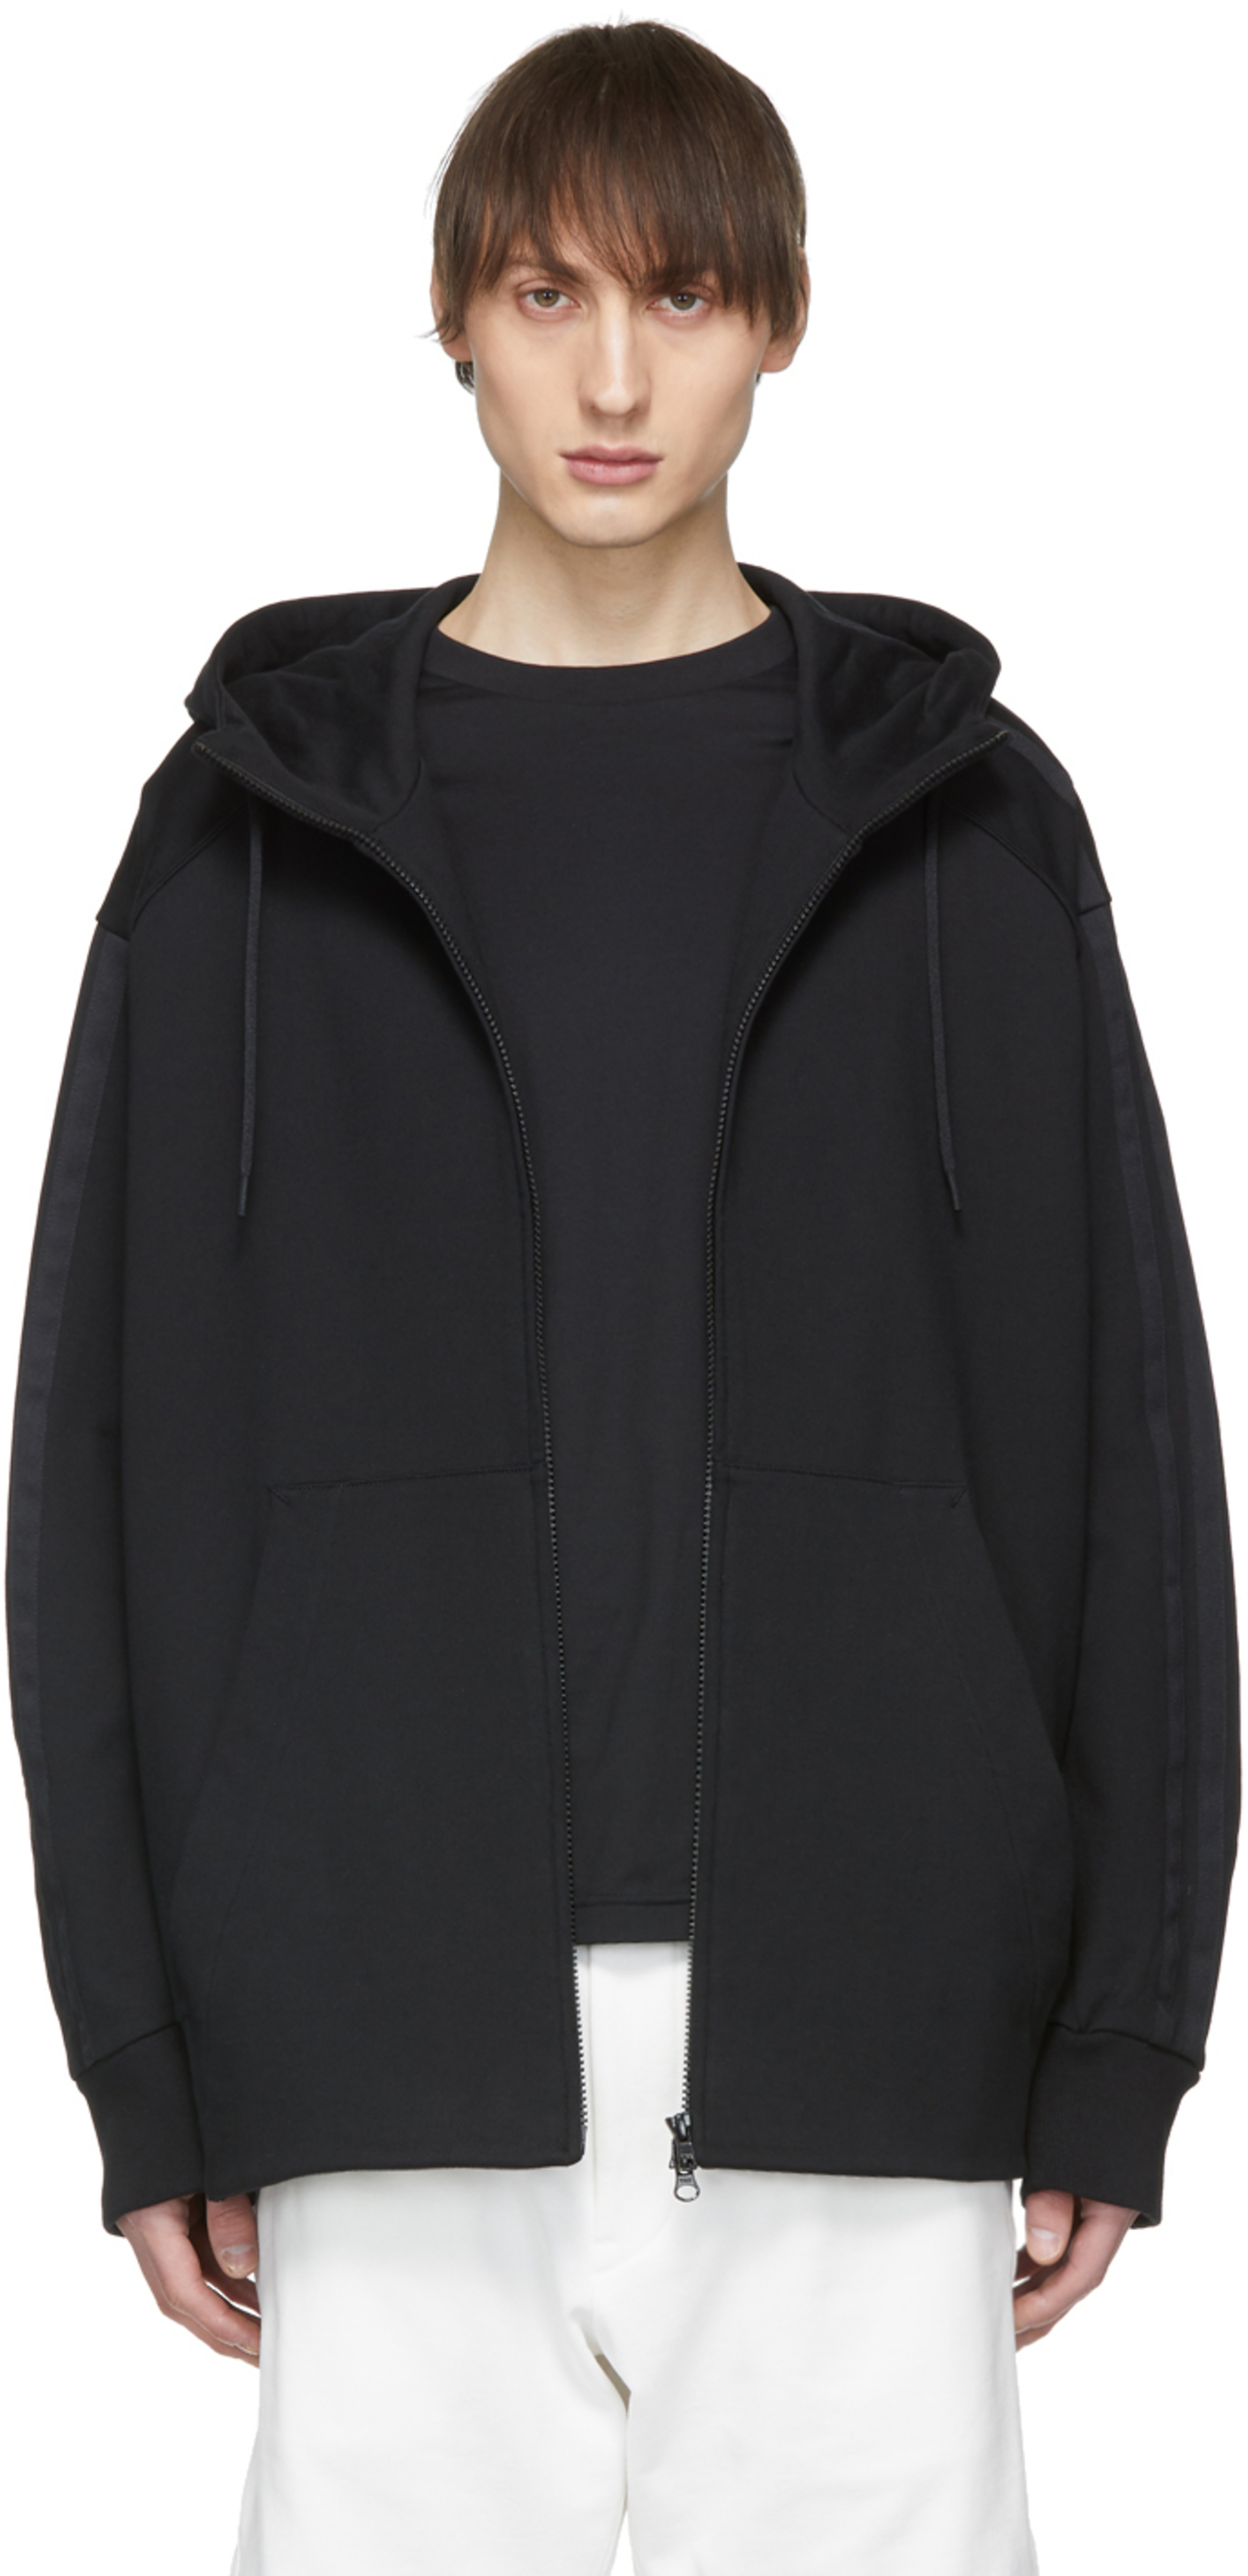 7dc5d78f38e3 Designer hoodies   zipups for Men